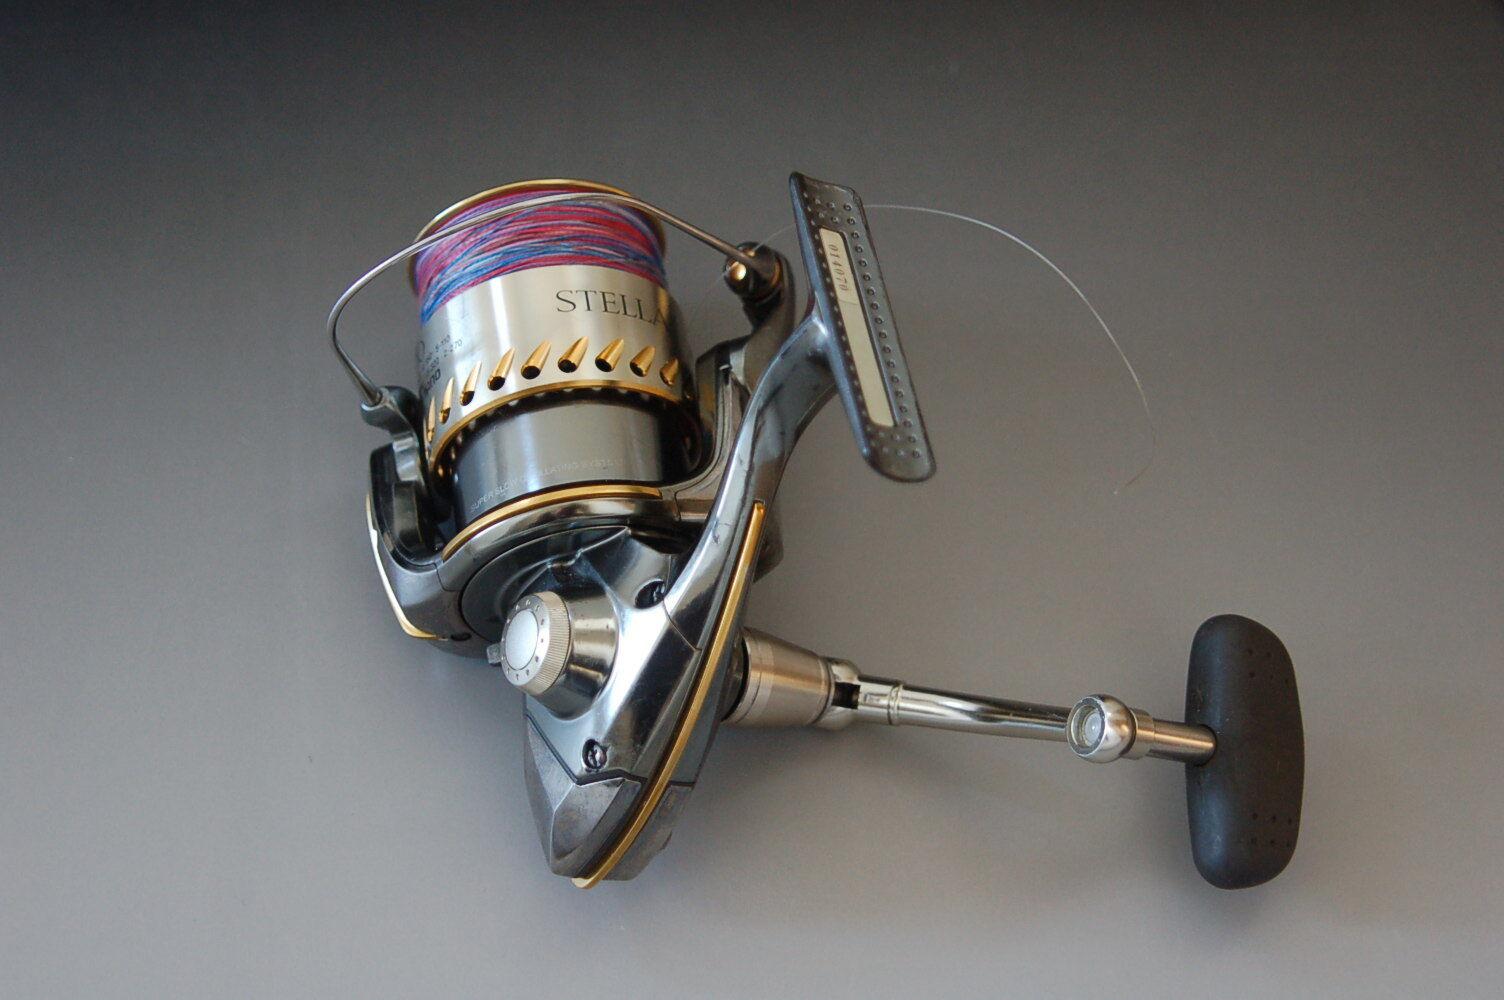 1b3cd3771d1 купить Shimano STELLA 2500S Spinning, с доставкой 2004 <u><b>Shimano